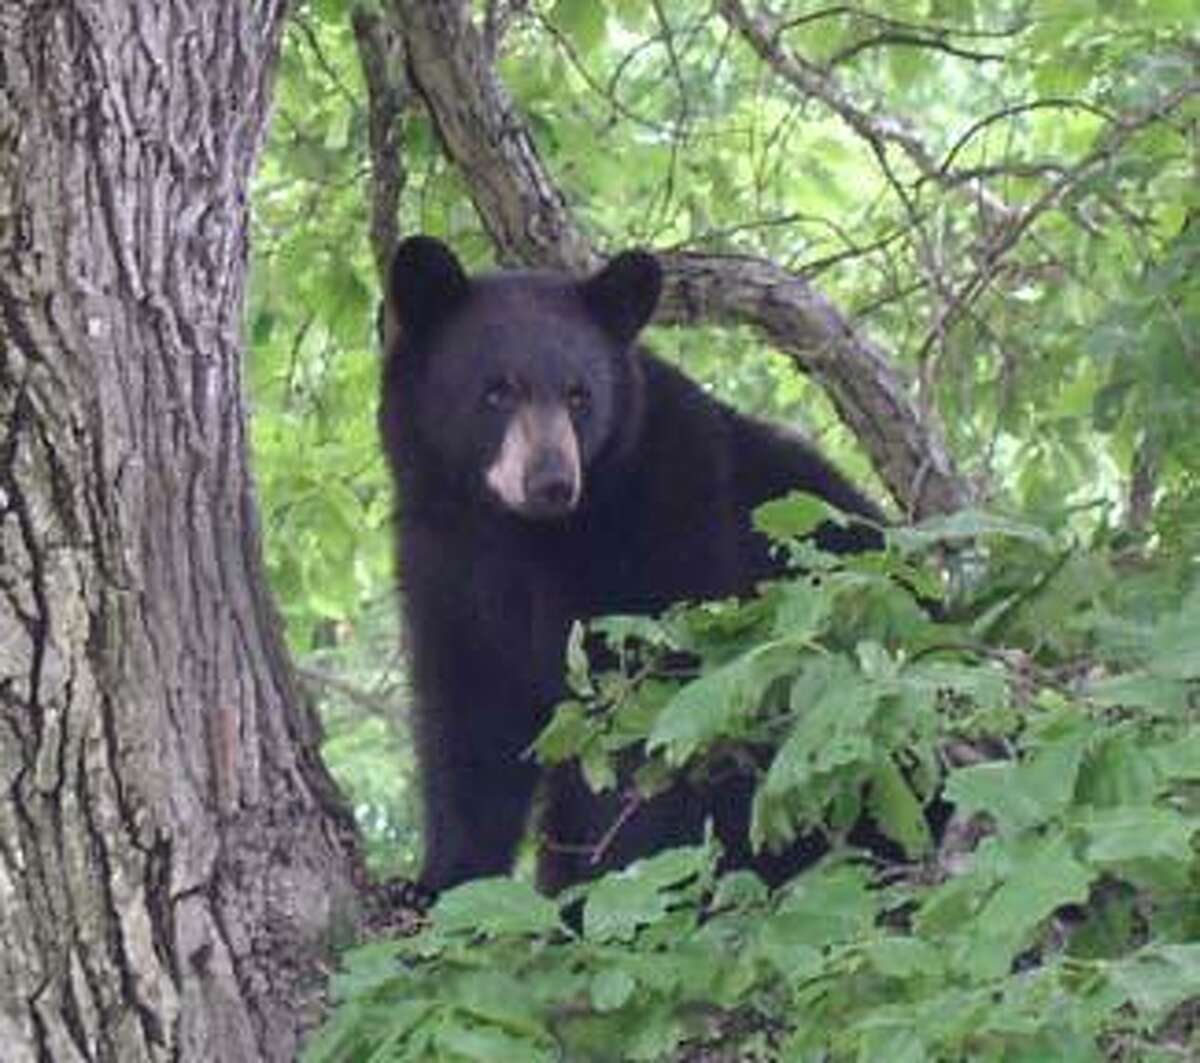 Black bear. DEEP photo.